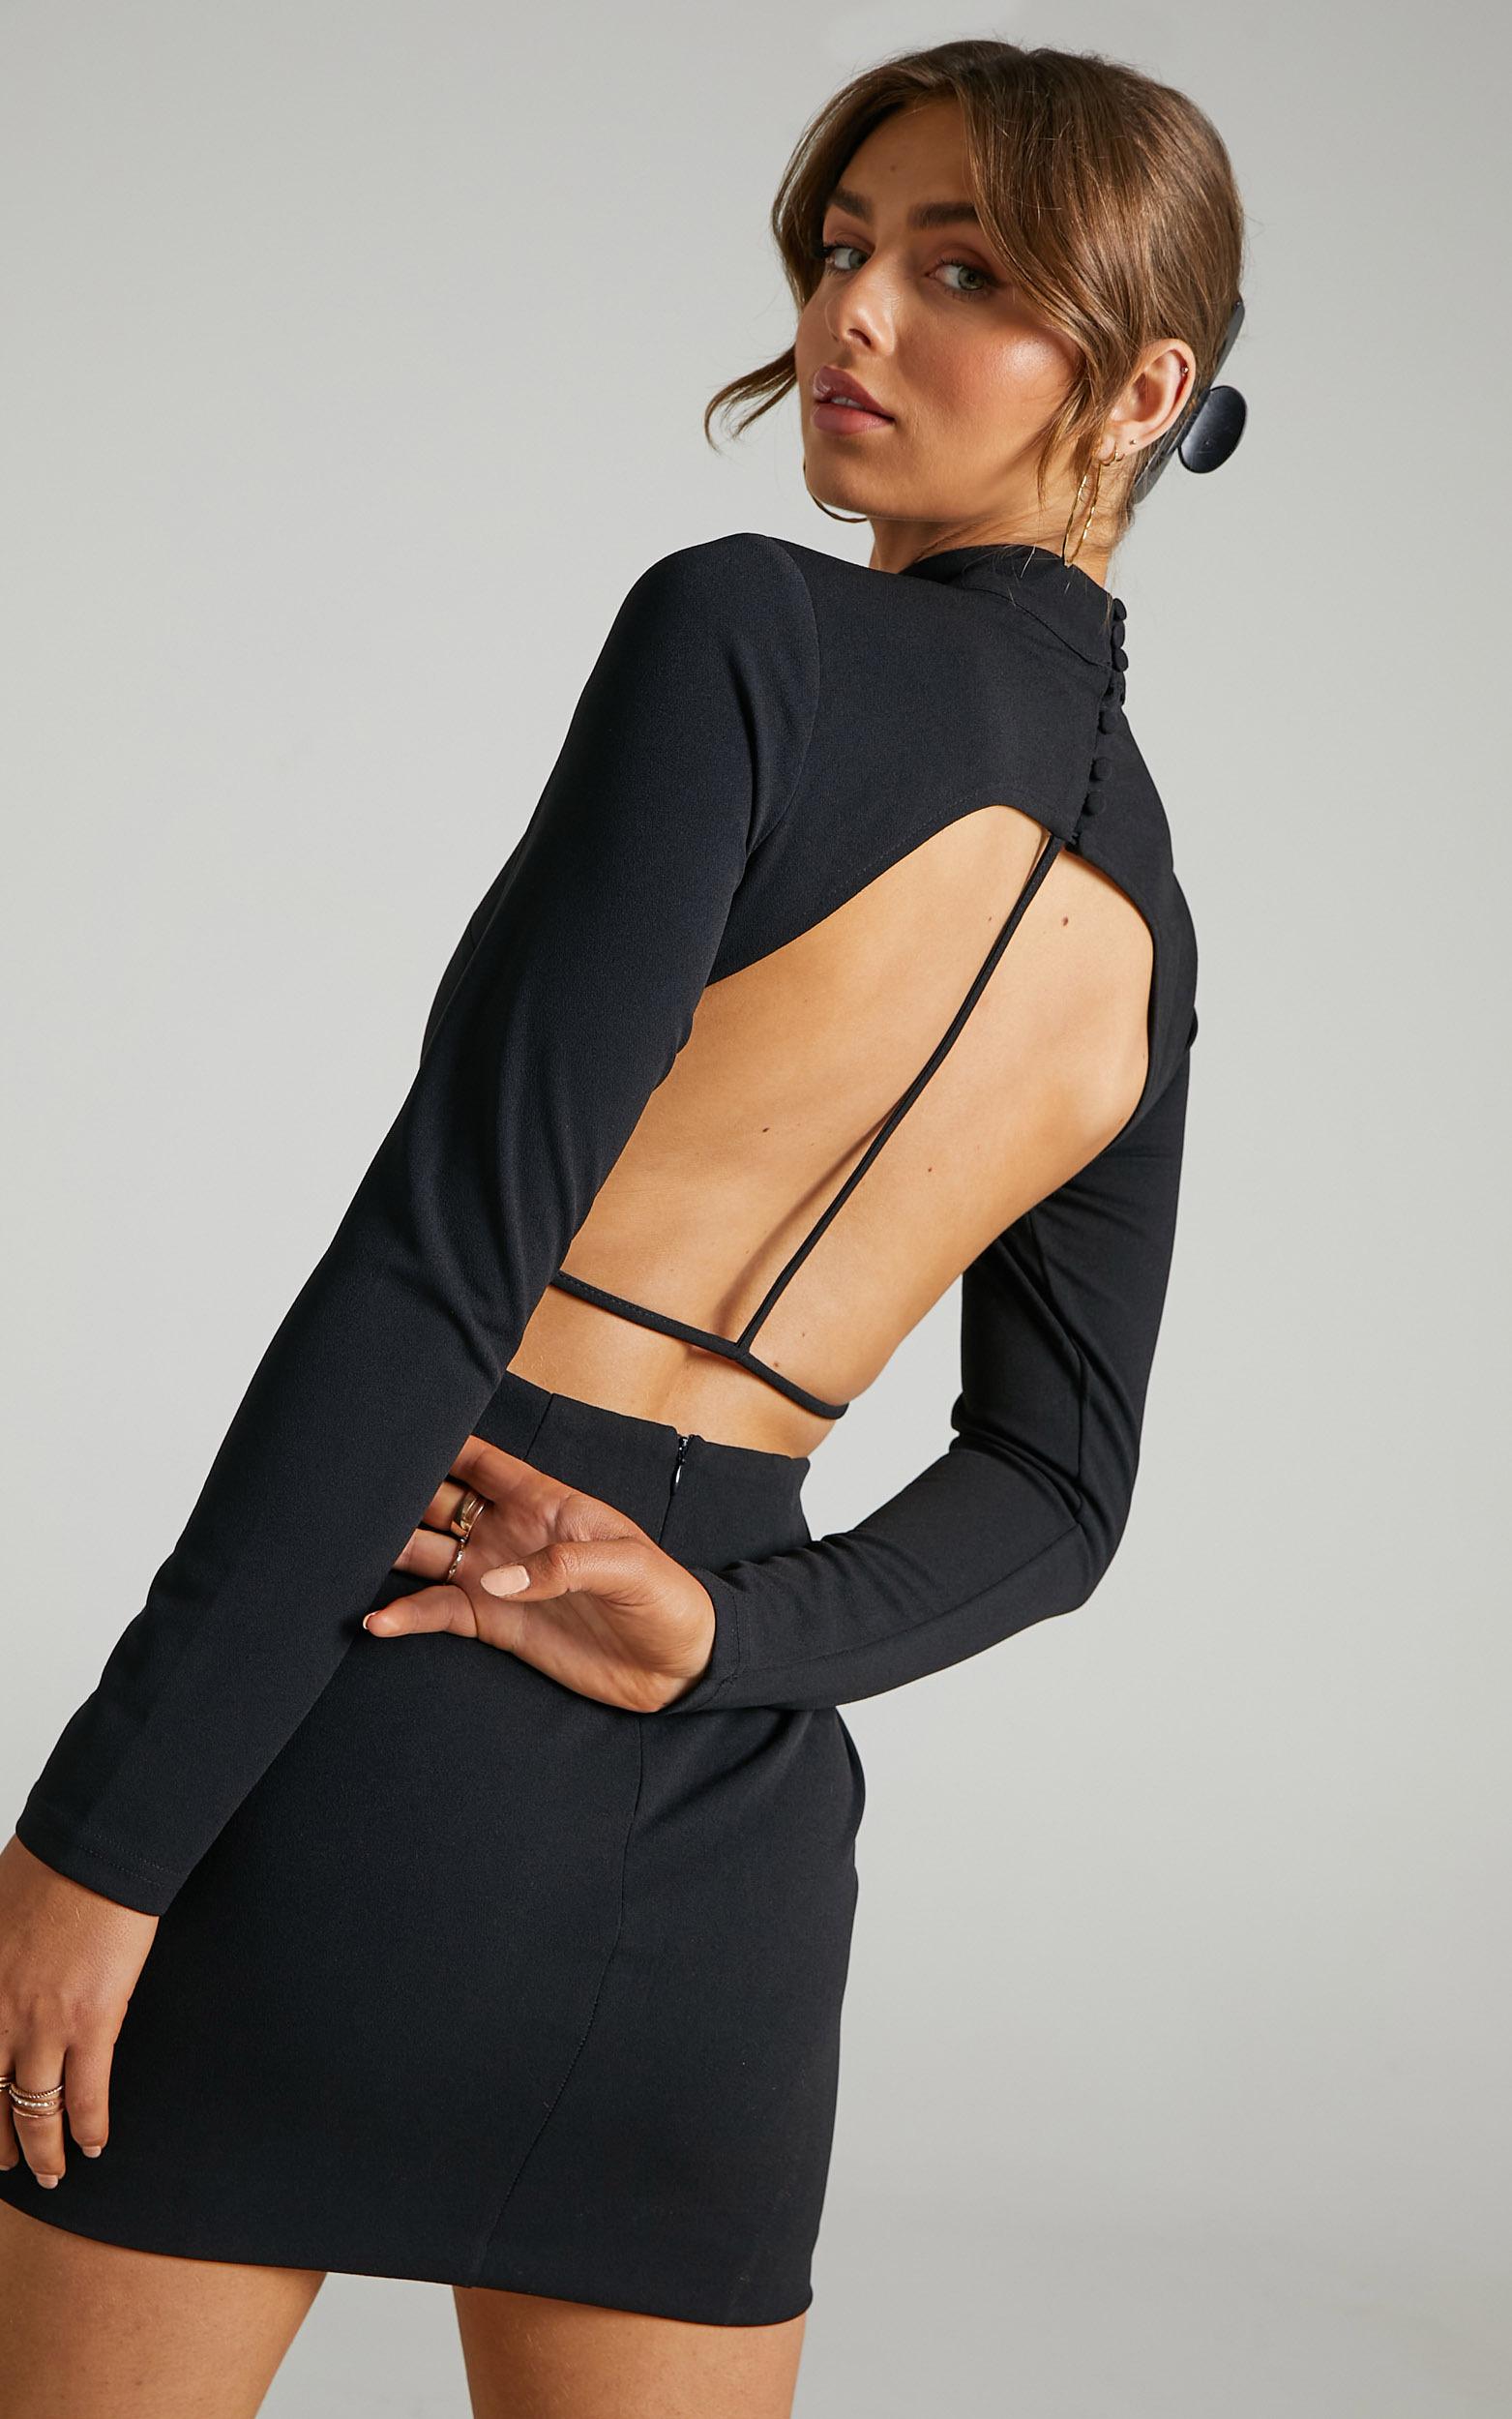 Eden Open Back Mini Bodycon Dress in Black - 06, BLK1, hi-res image number null